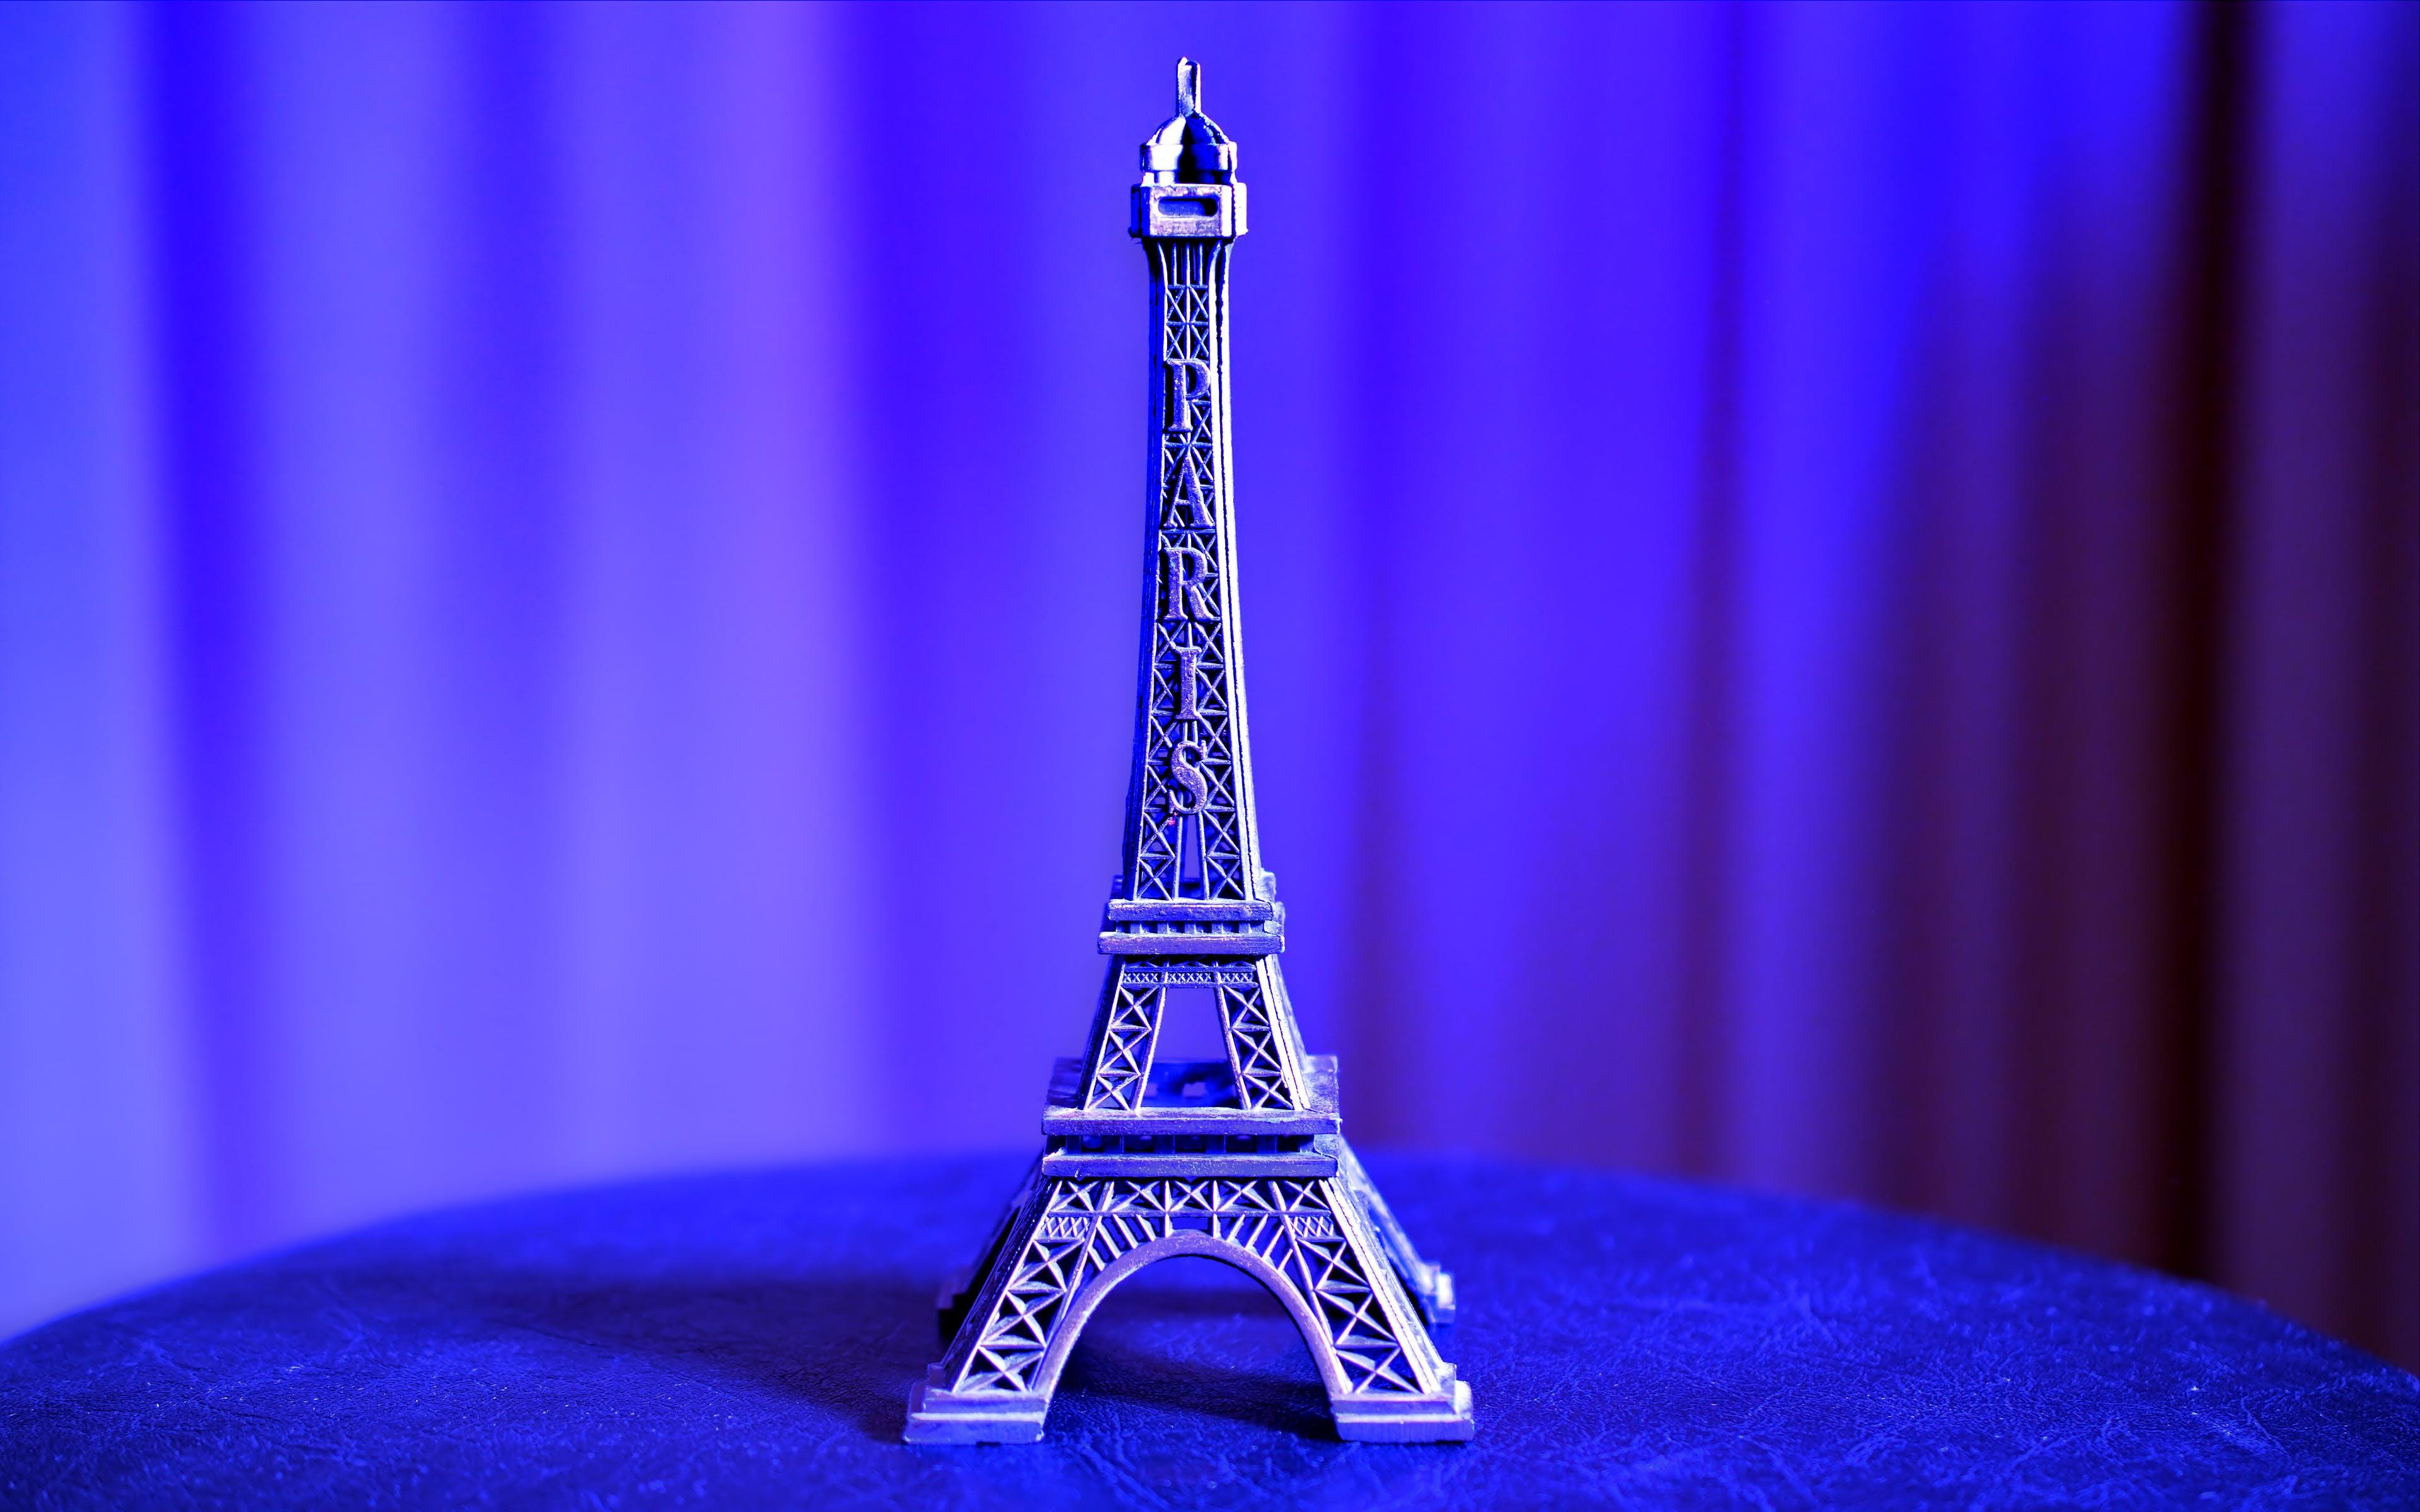 Eiffel Tower Miniature on Blue Textile